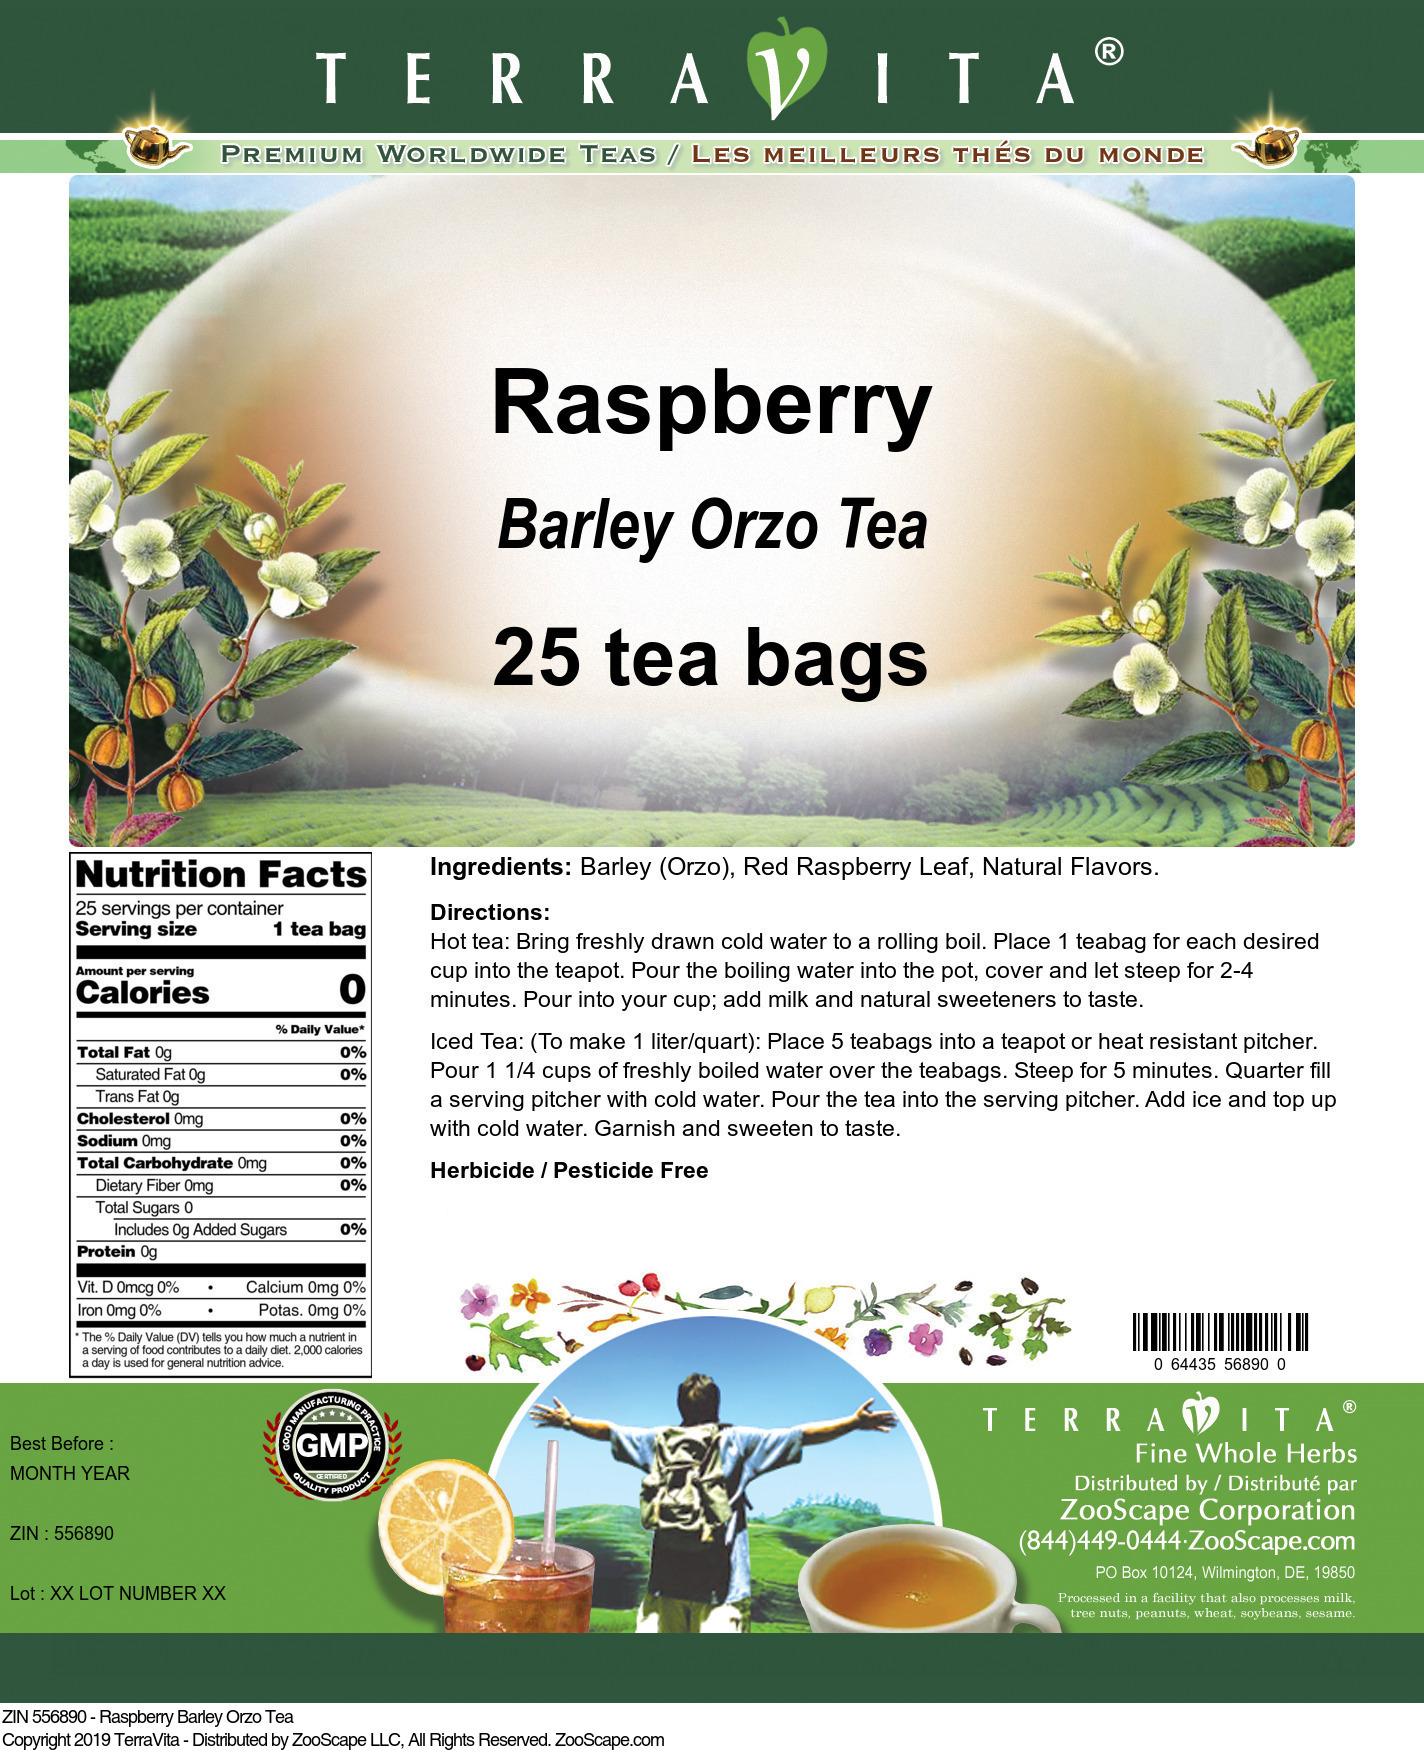 Raspberry Barley Orzo